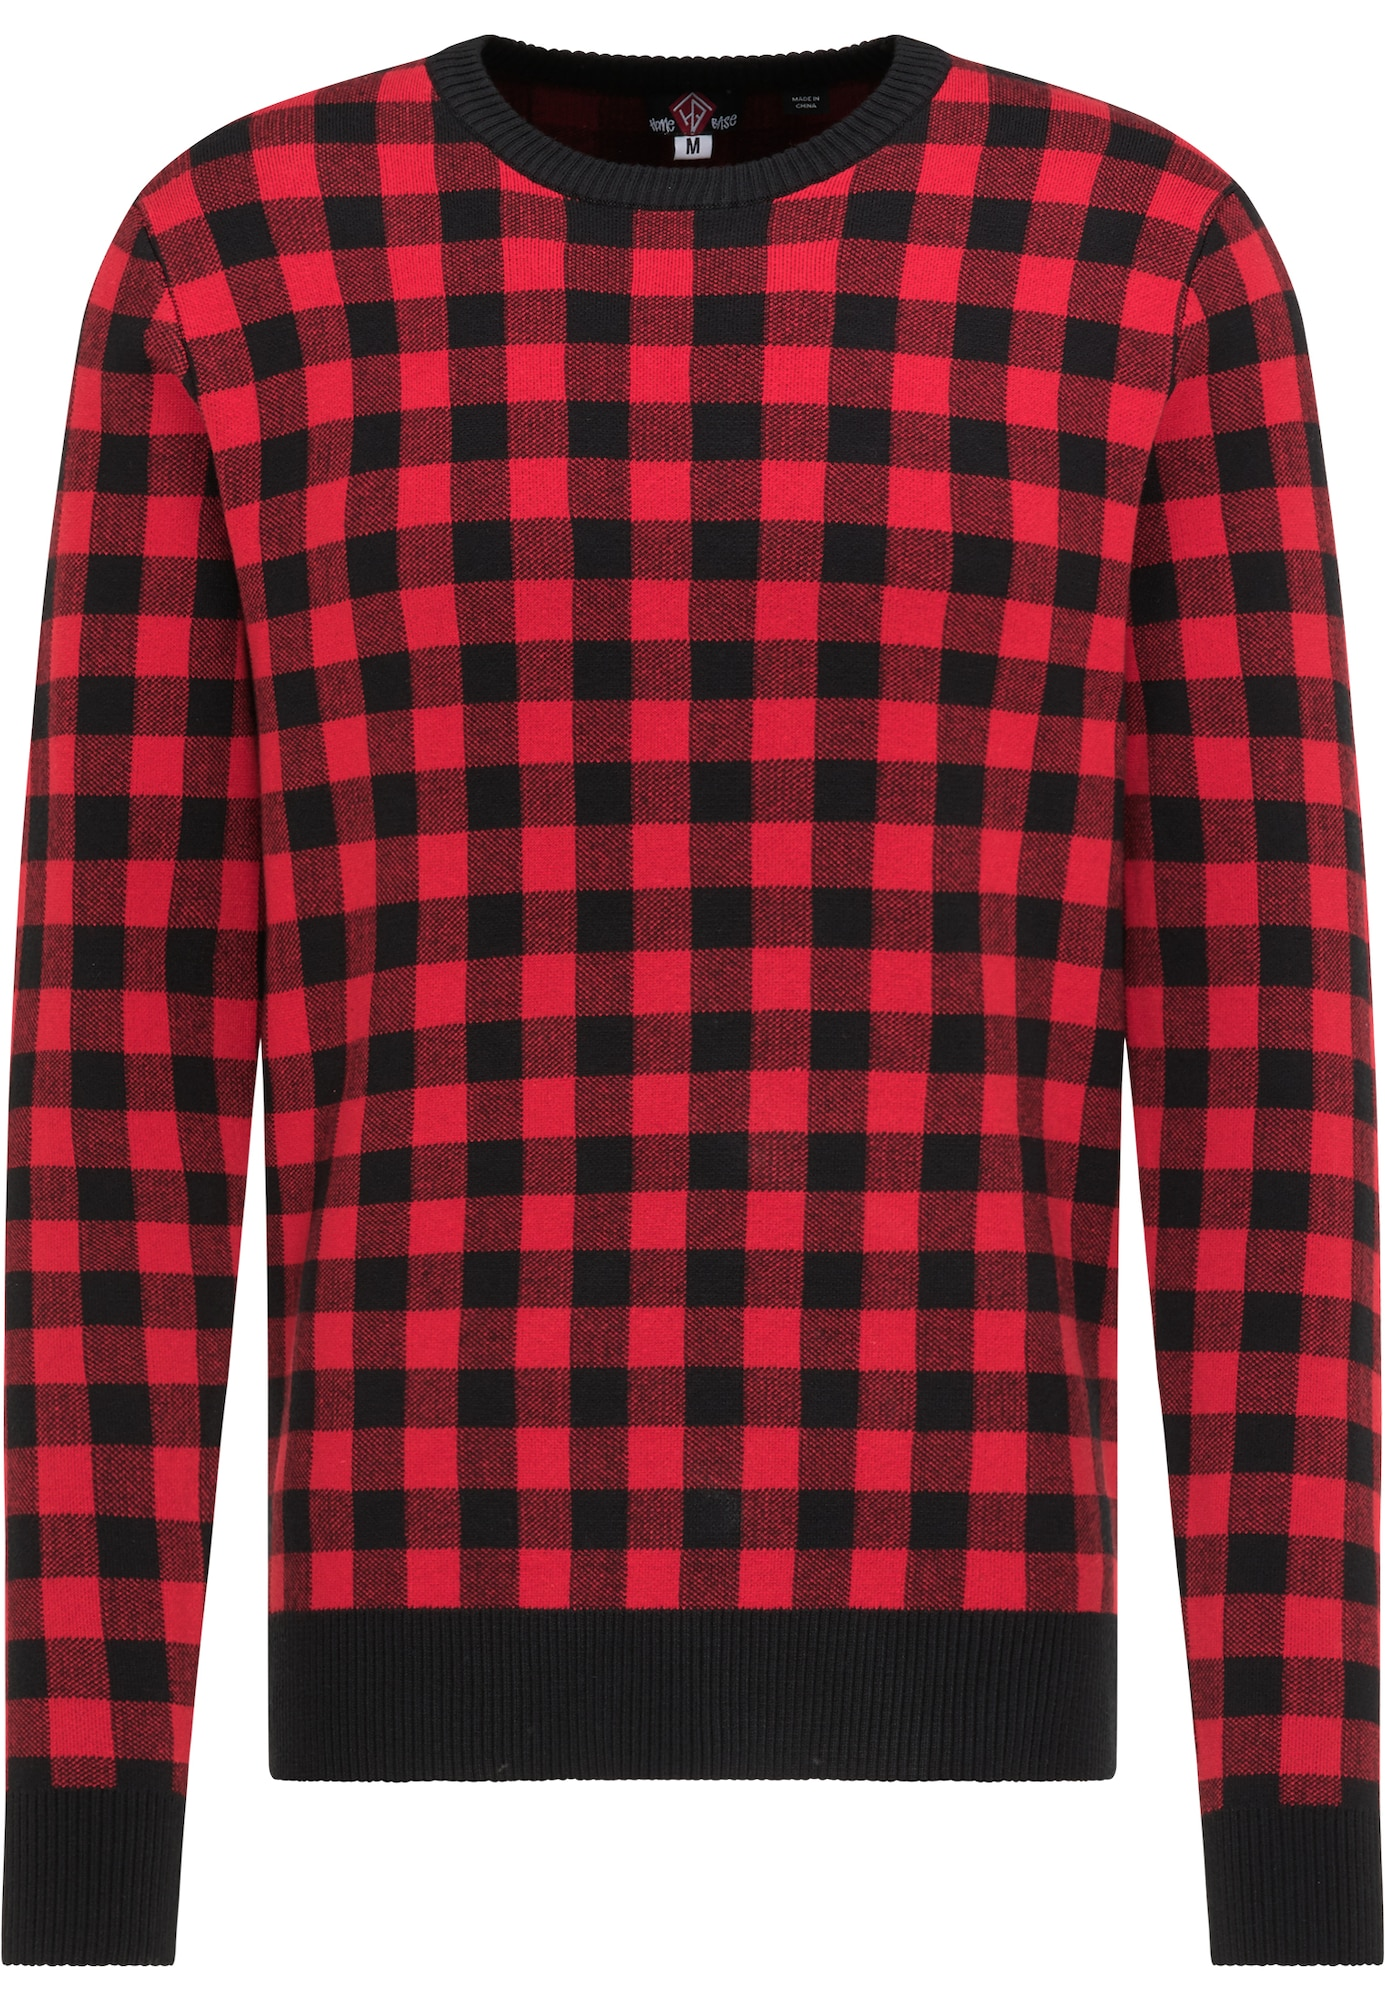 HOMEBASE Megztinis juoda / ugnies raudona